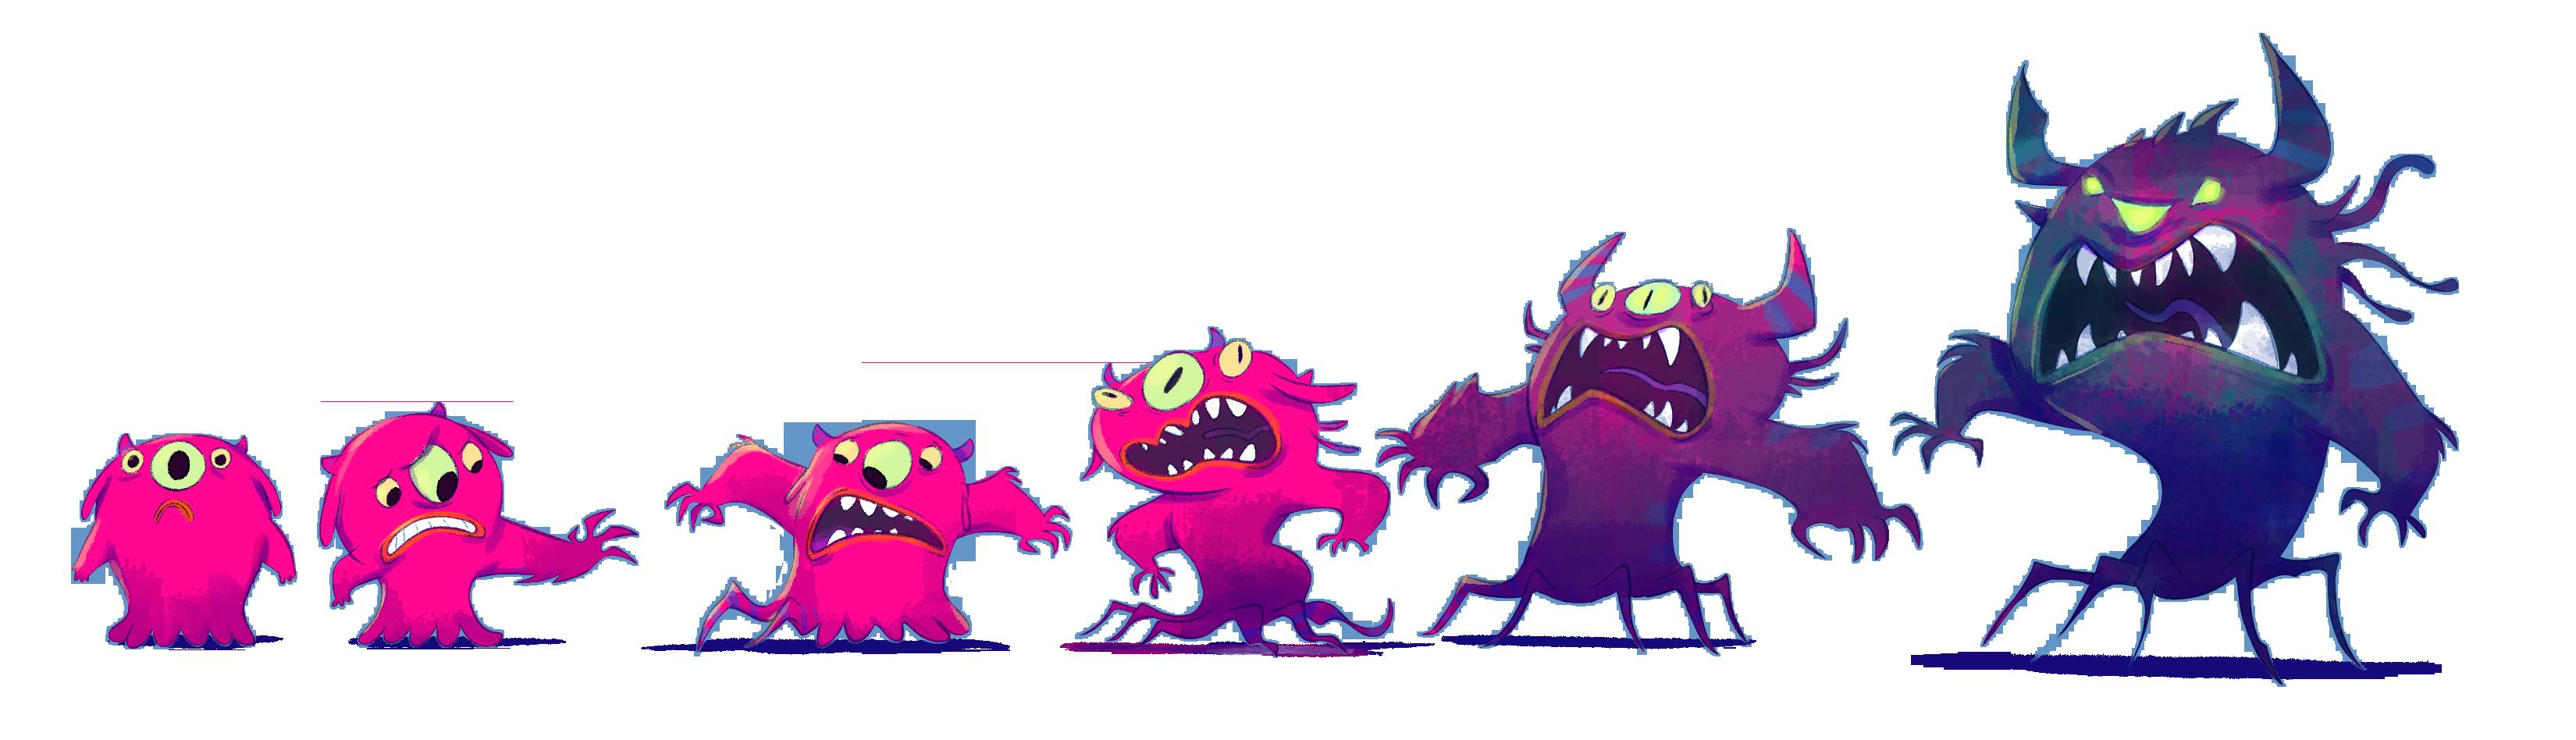 EVOLUCION monstruo